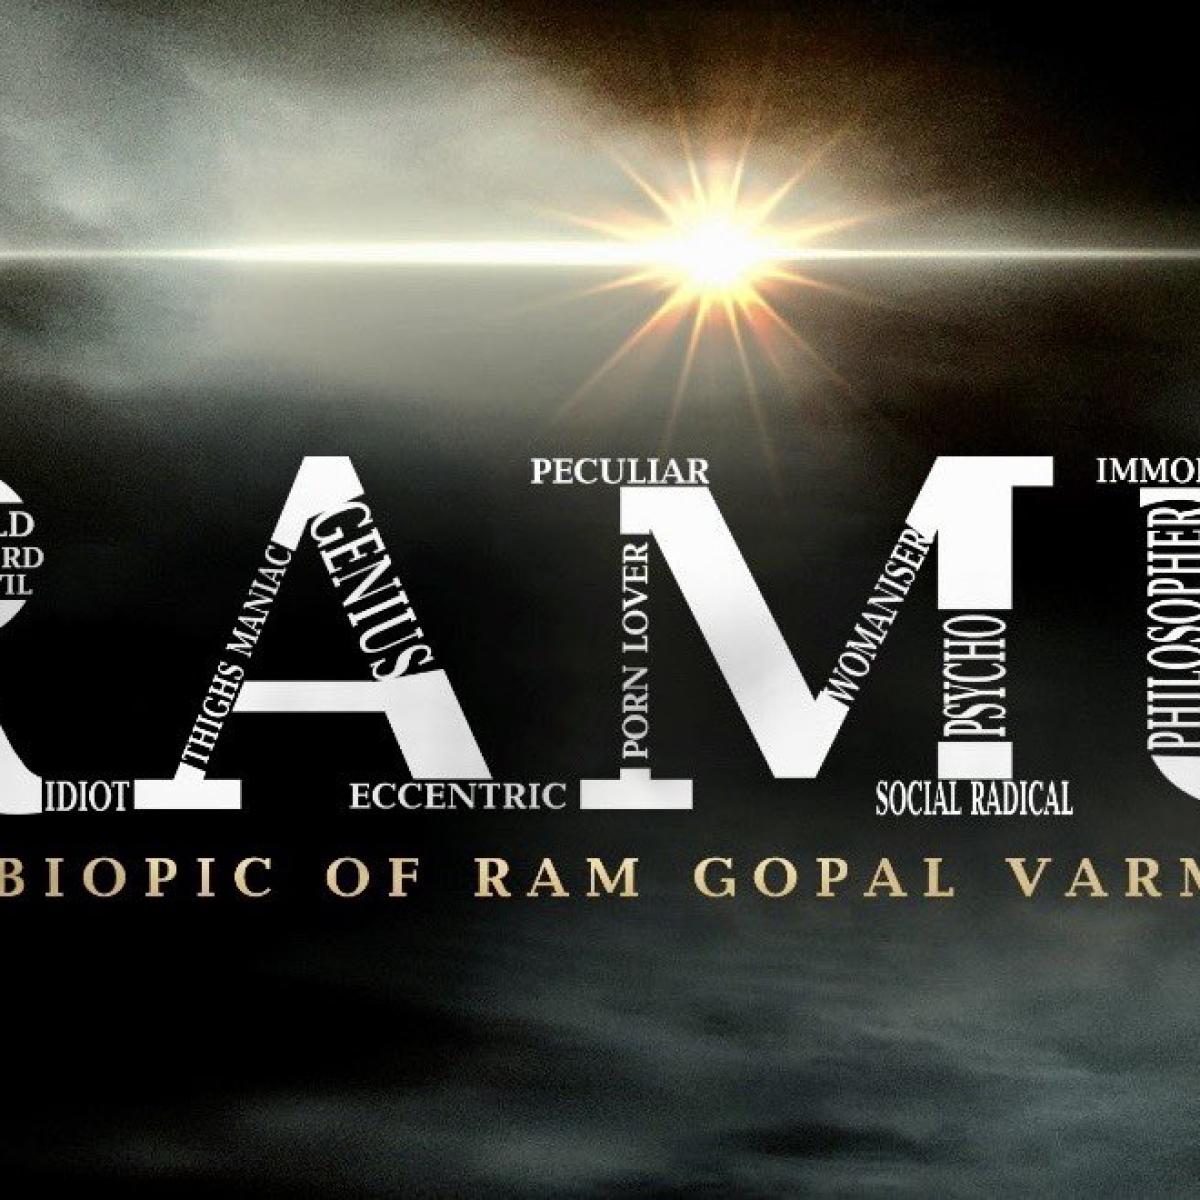 'Thighs Maniac, Porn Lover': Ram Gopal Varma announces 6-hour biopic 'RAMU' with very bizarre additions